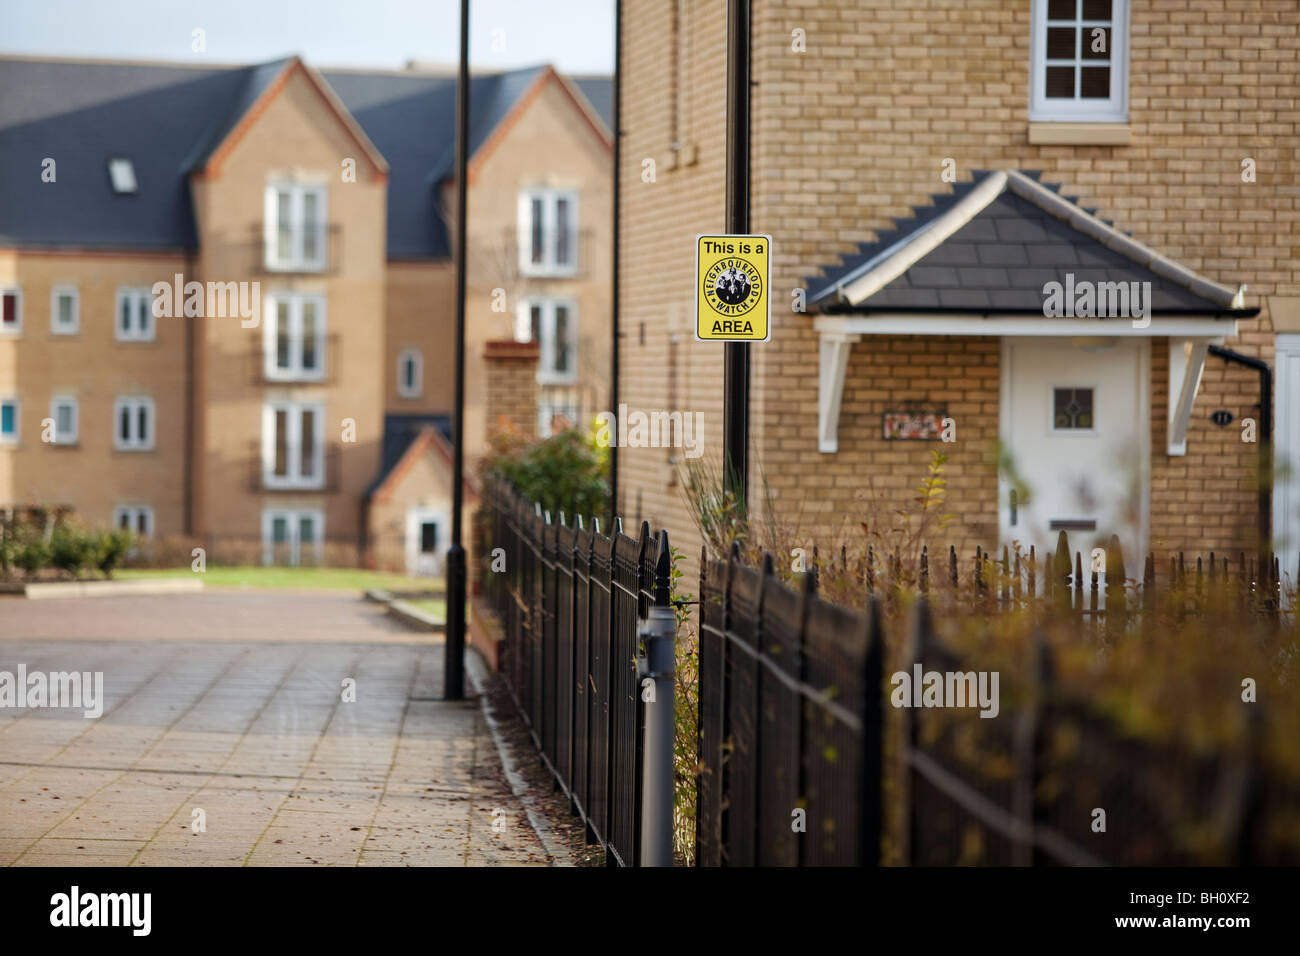 A neighbourhood watch sign on a housing estate in Northampton, UK - Stock Image